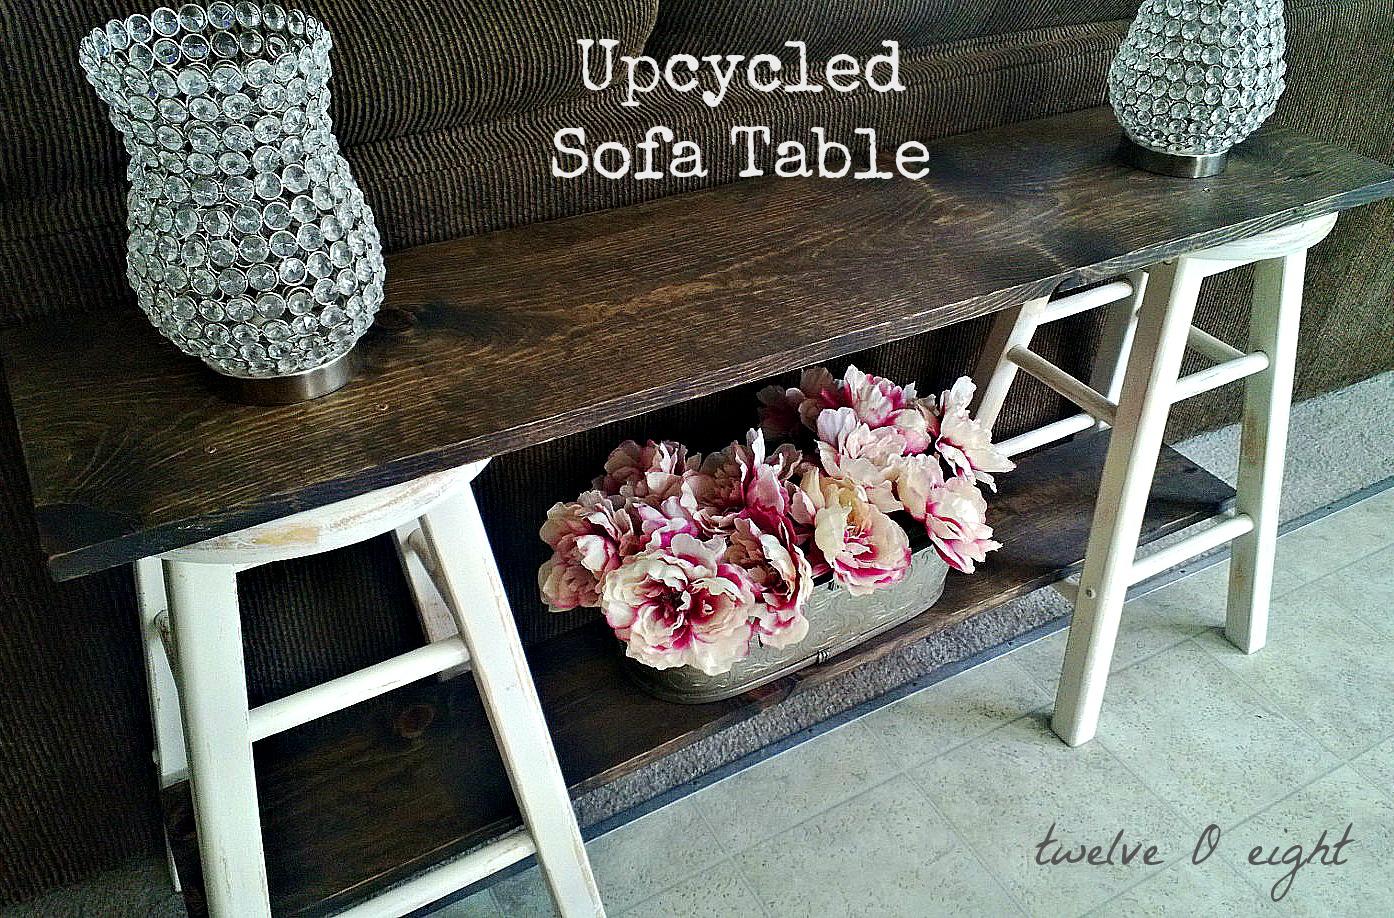 Upcycled Sofa Table